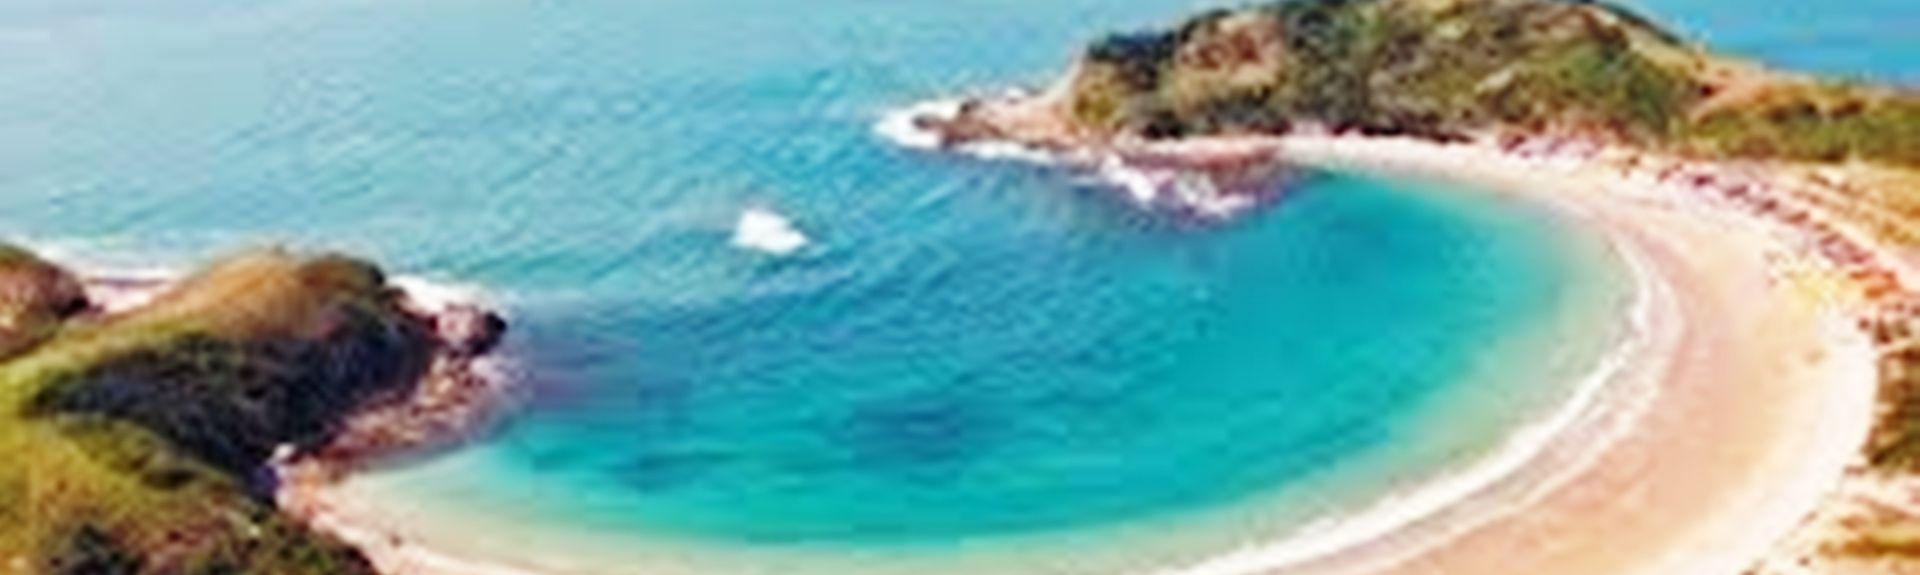 Dunas Beach, Cabo Frio, Brazil